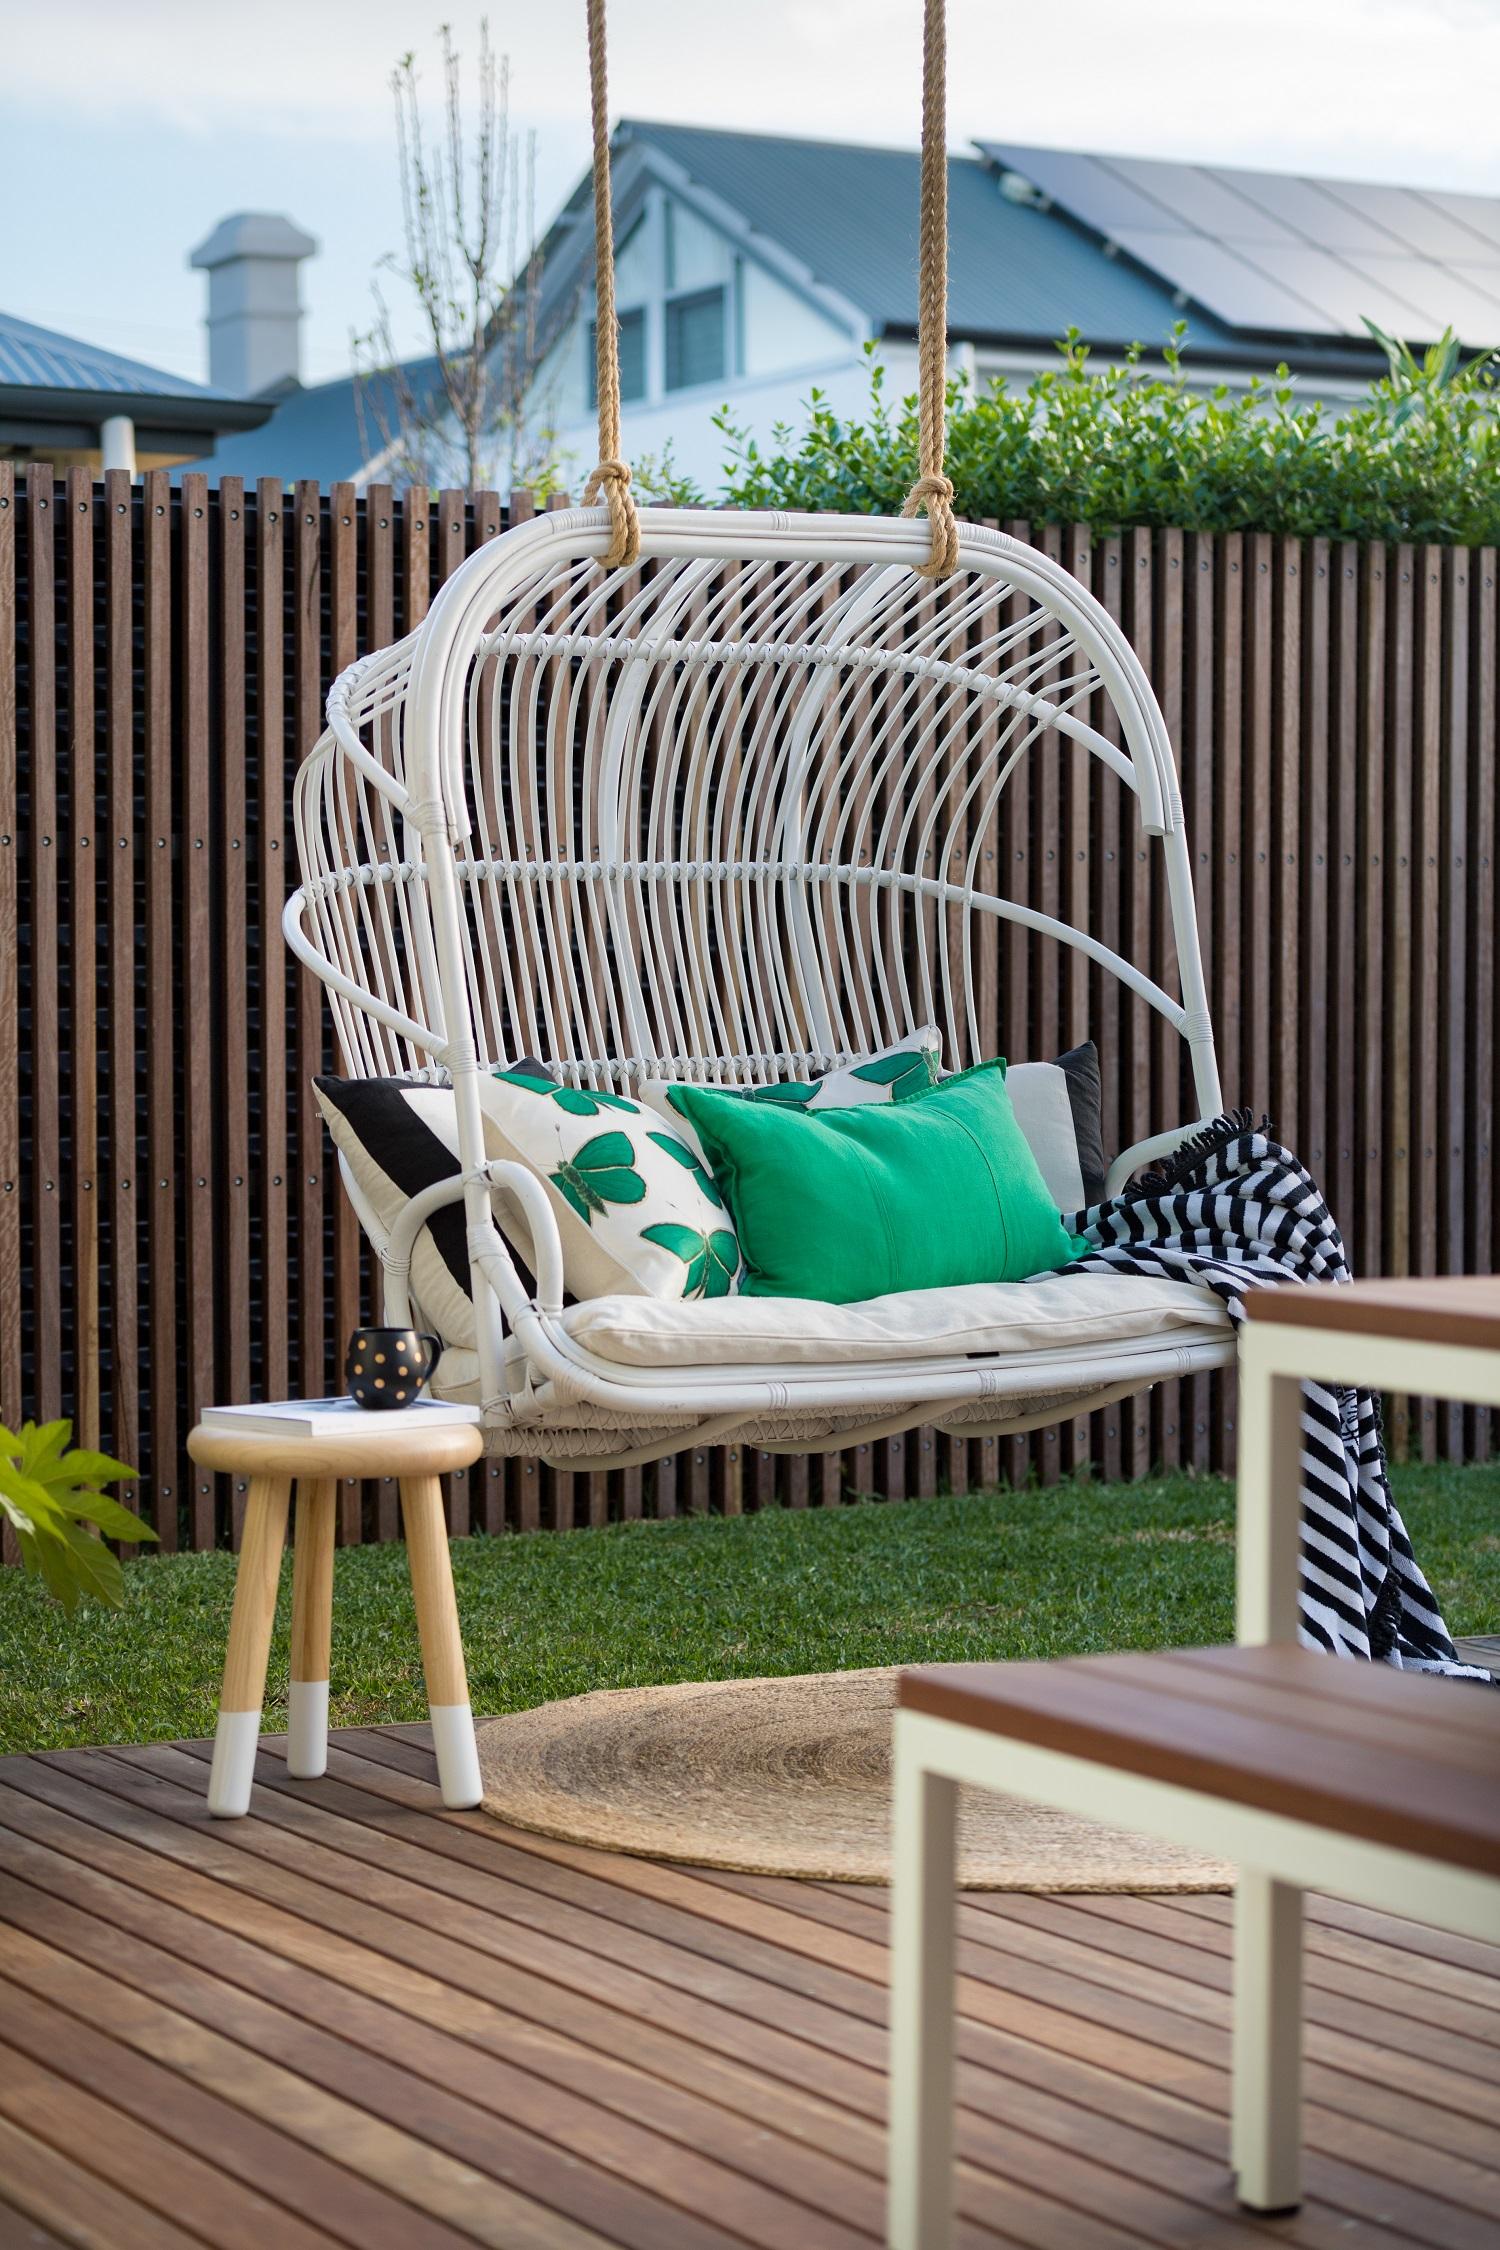 byron_bay_hanging_chair.jpg